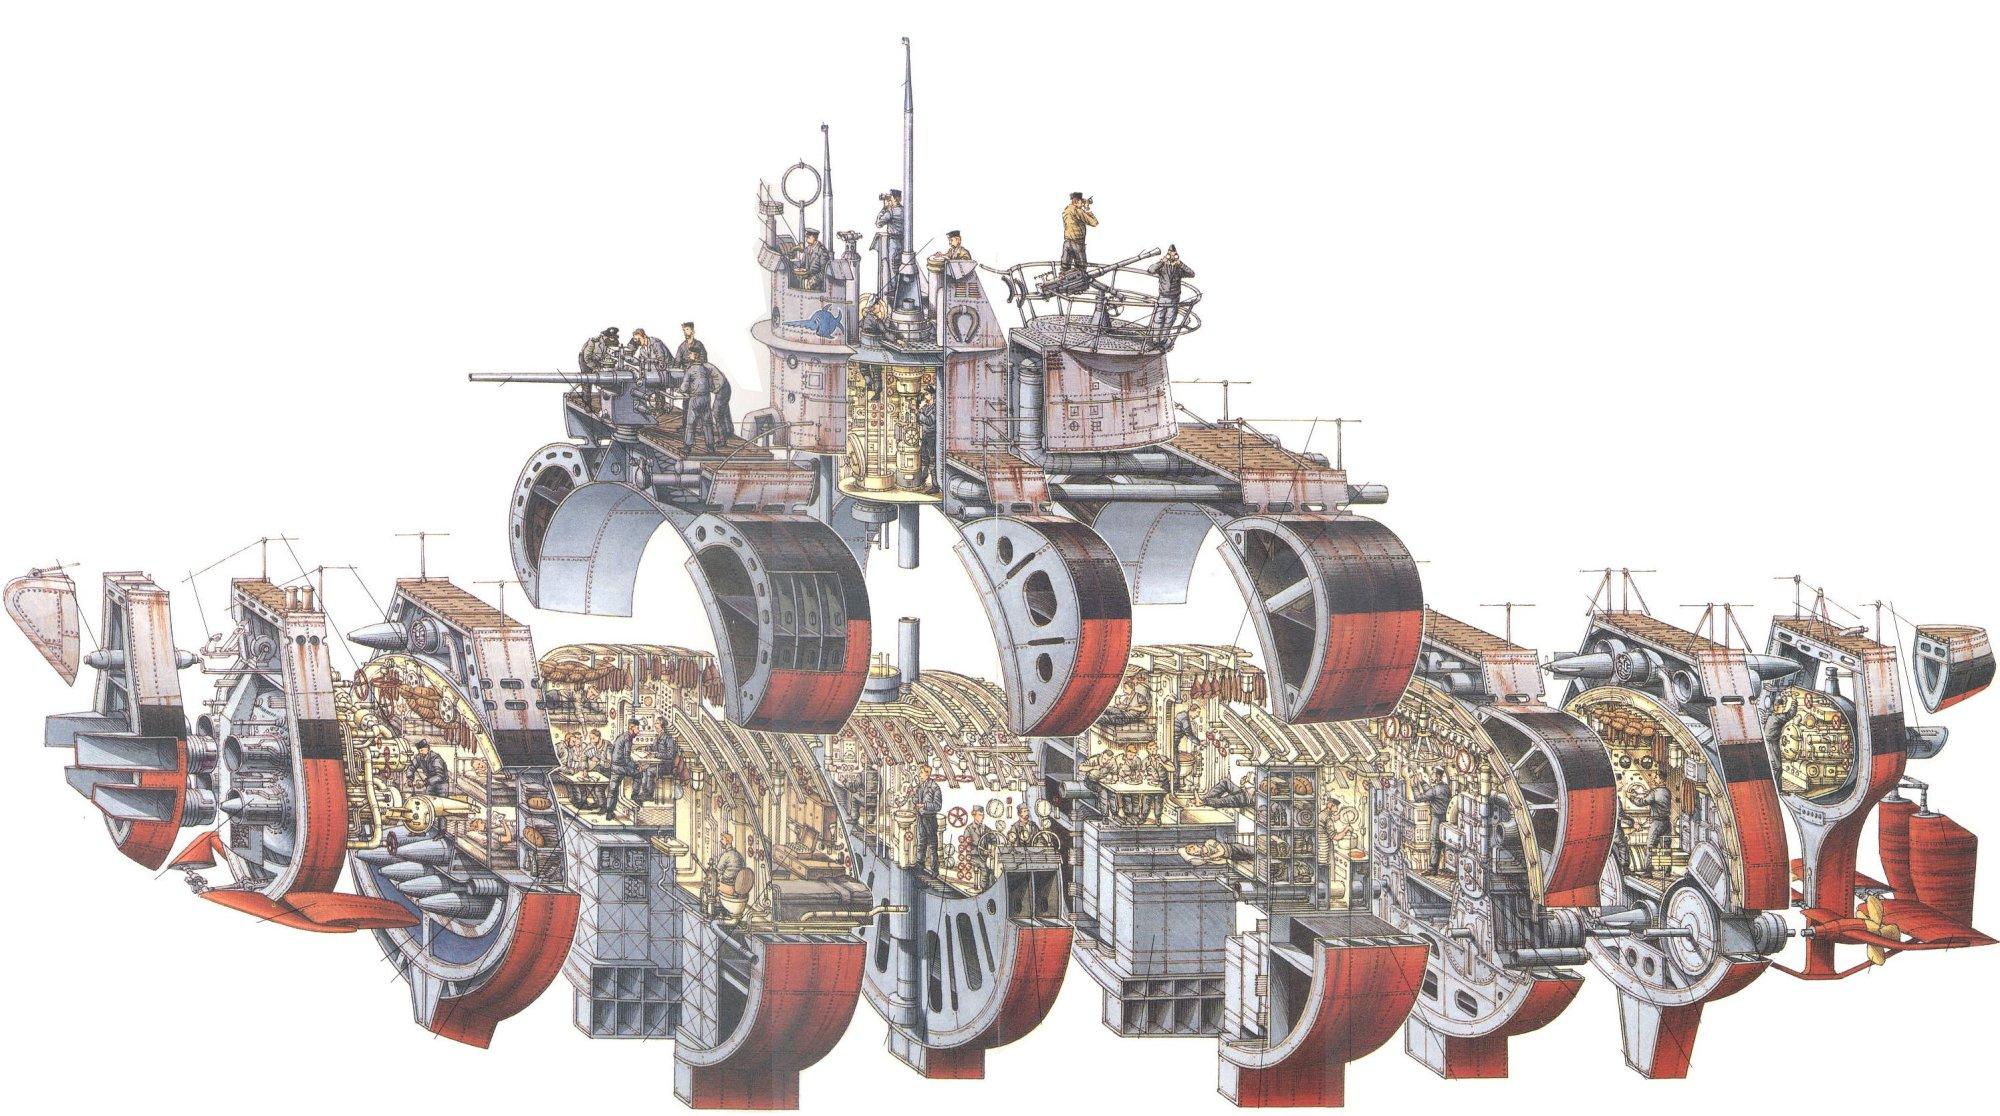 hight resolution of type vii u boat cutaway by stephen biesty